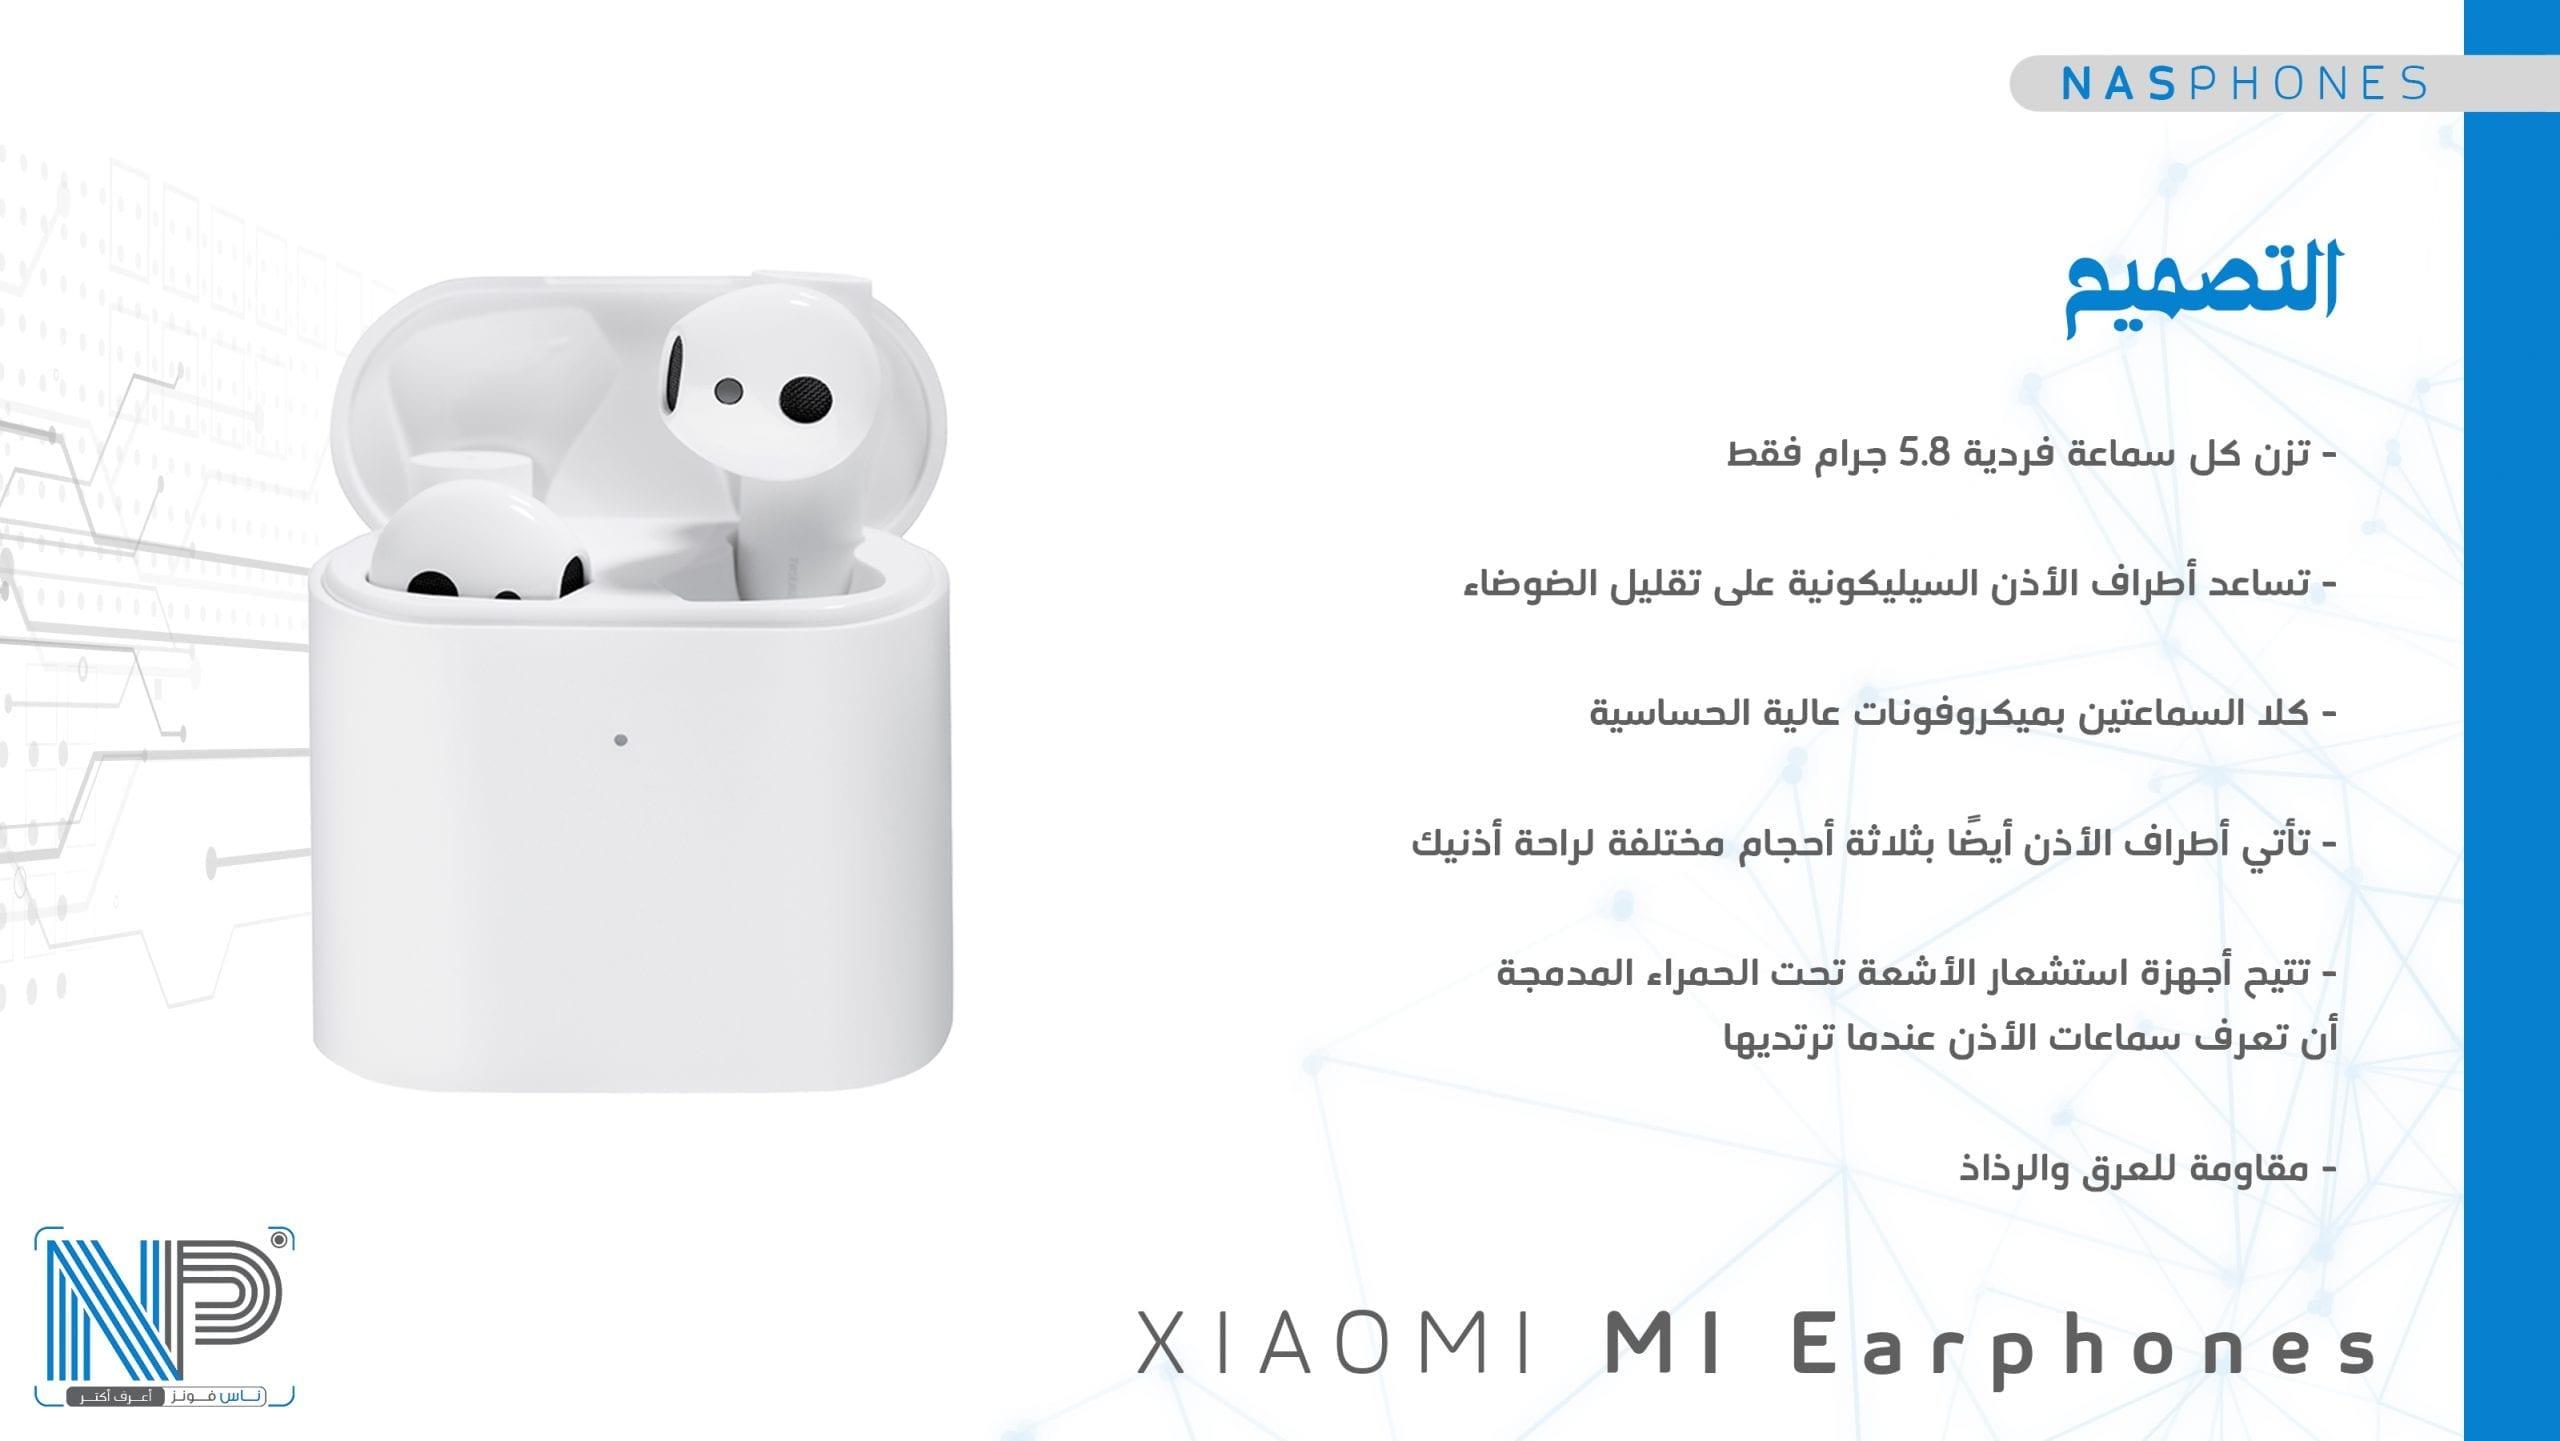 تصميم Xiaomi mi Earphones